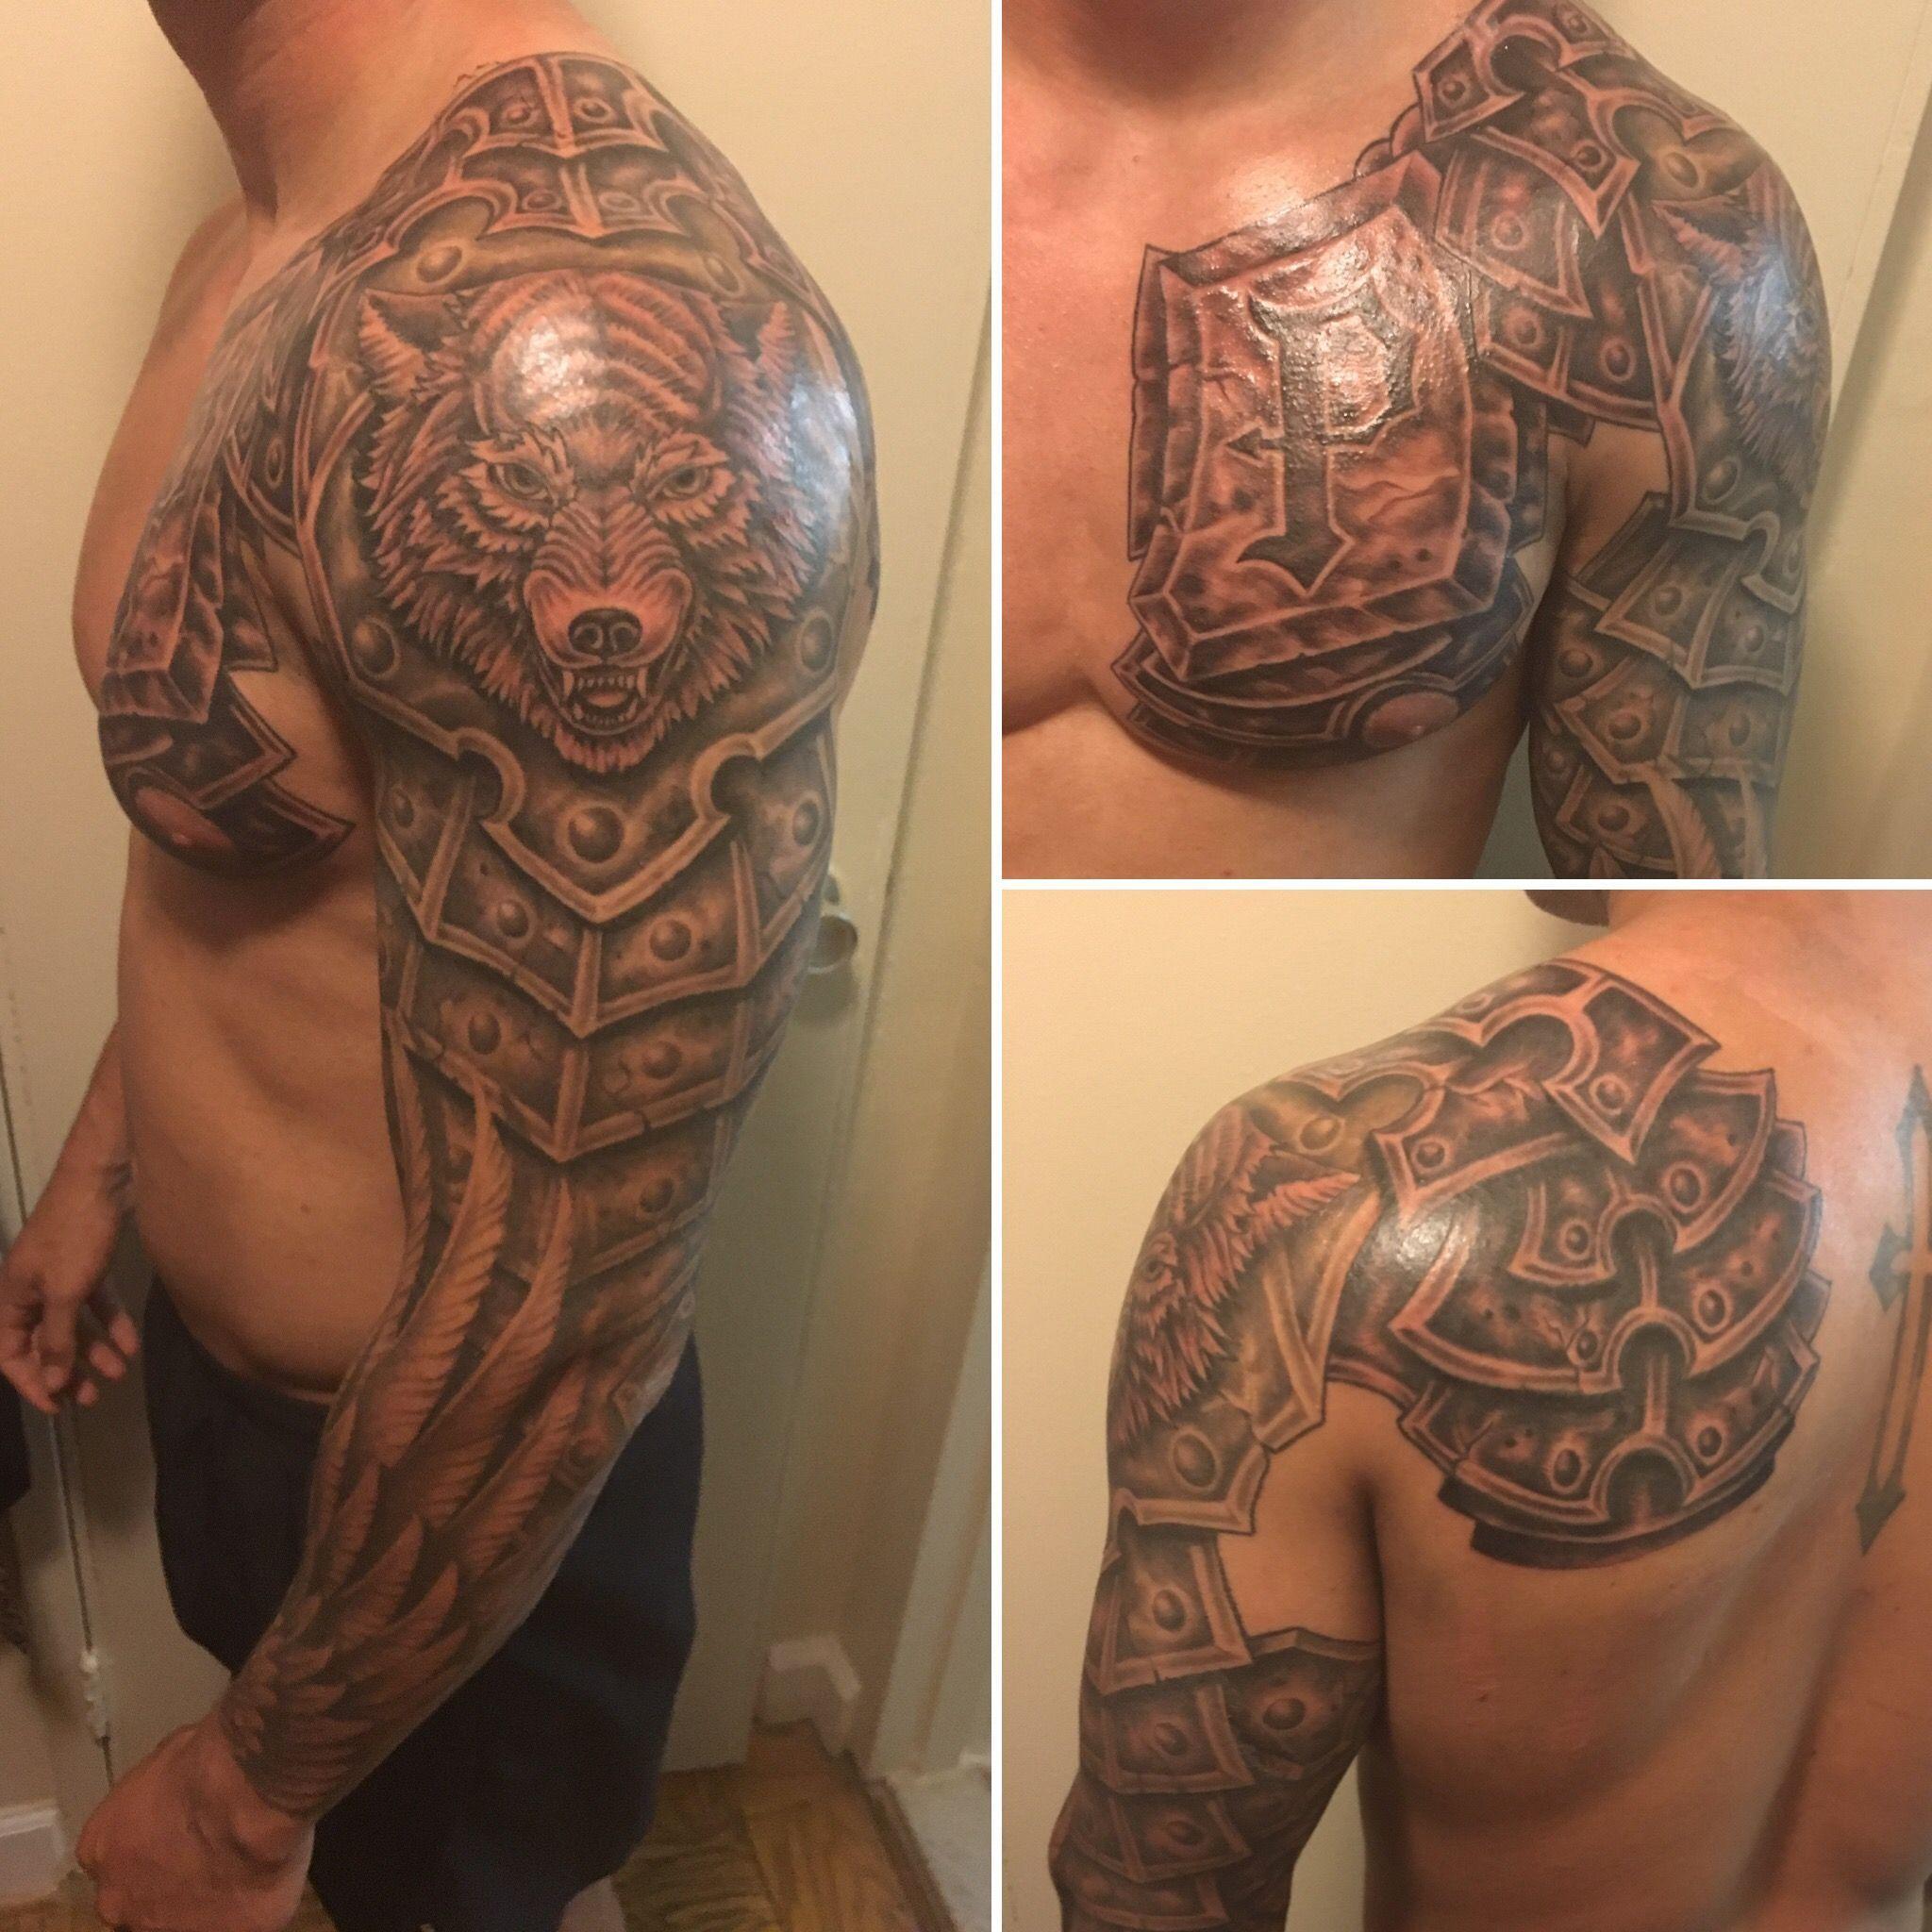 Samoantattoos Shoulder Armor Tattoo Armour Tattoo Armor Sleeve Tattoo